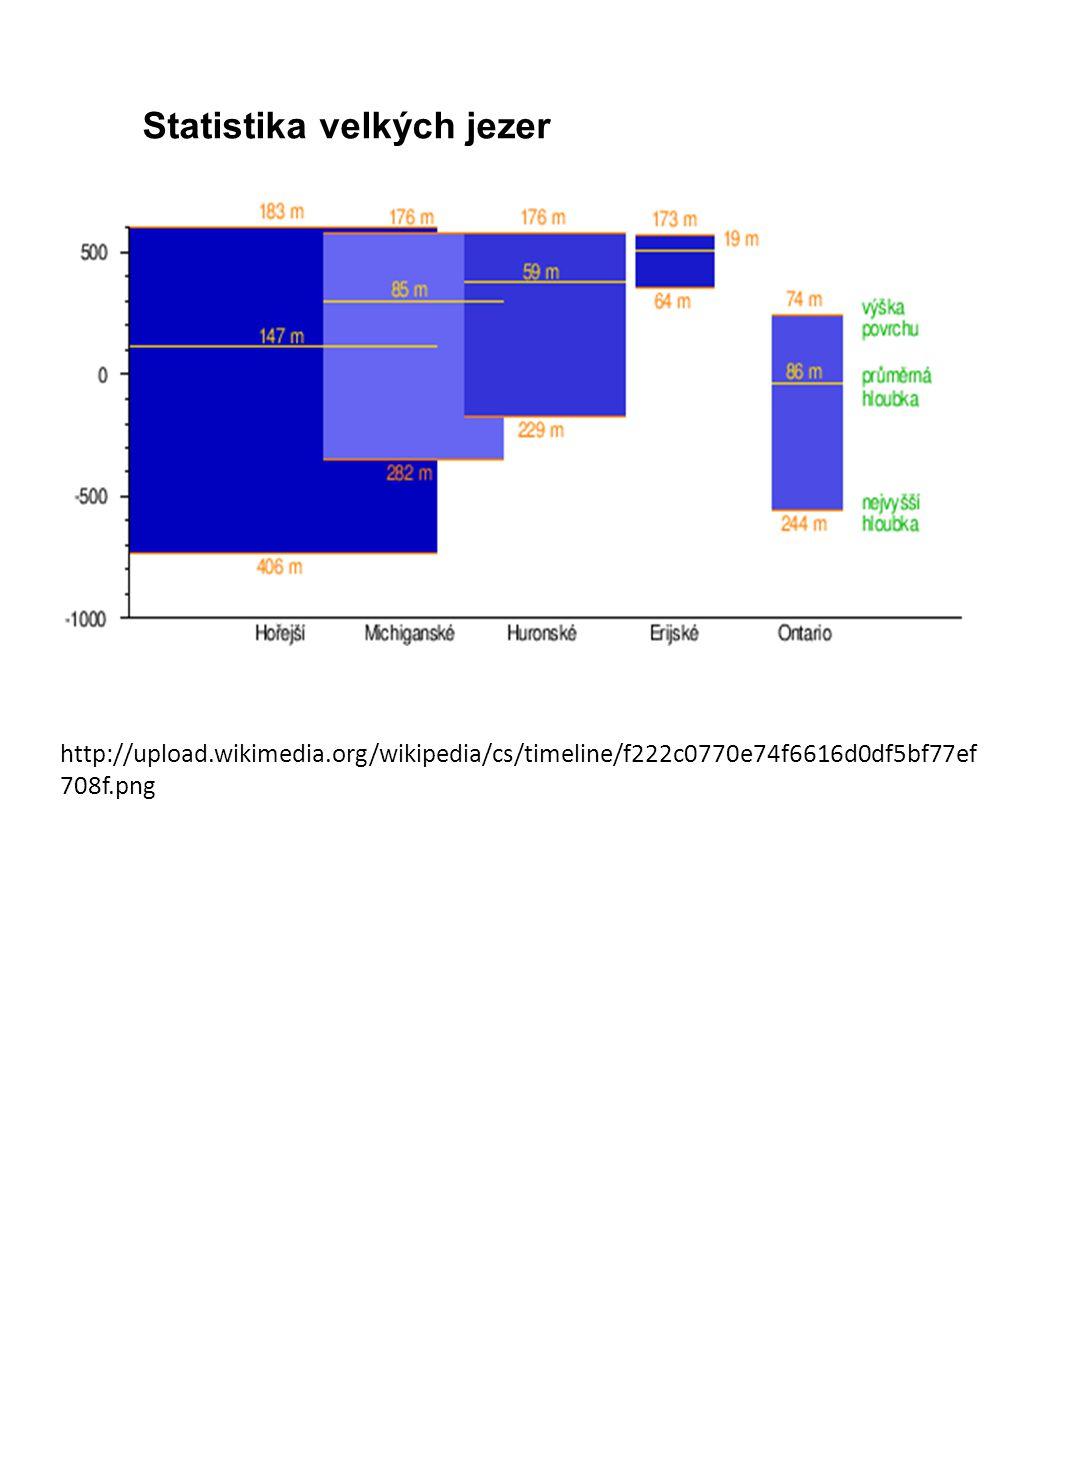 http://upload.wikimedia.org/wikipedia/cs/timeline/f222c0770e74f6616d0df5bf77ef 708f.png Statistika velkých jezer